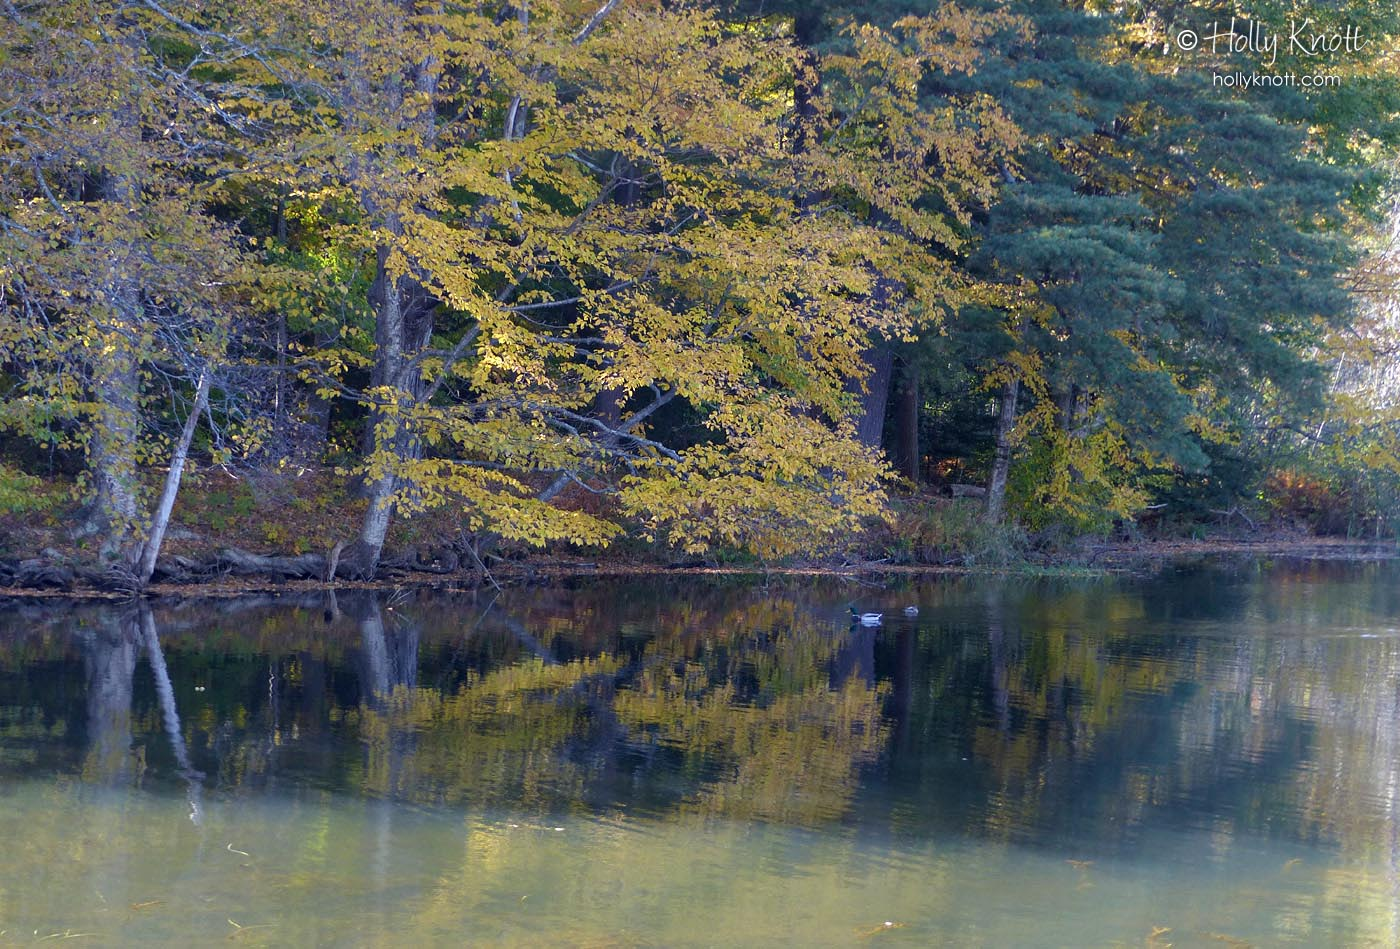 Reflections on Laurel Lake, Lee, MA